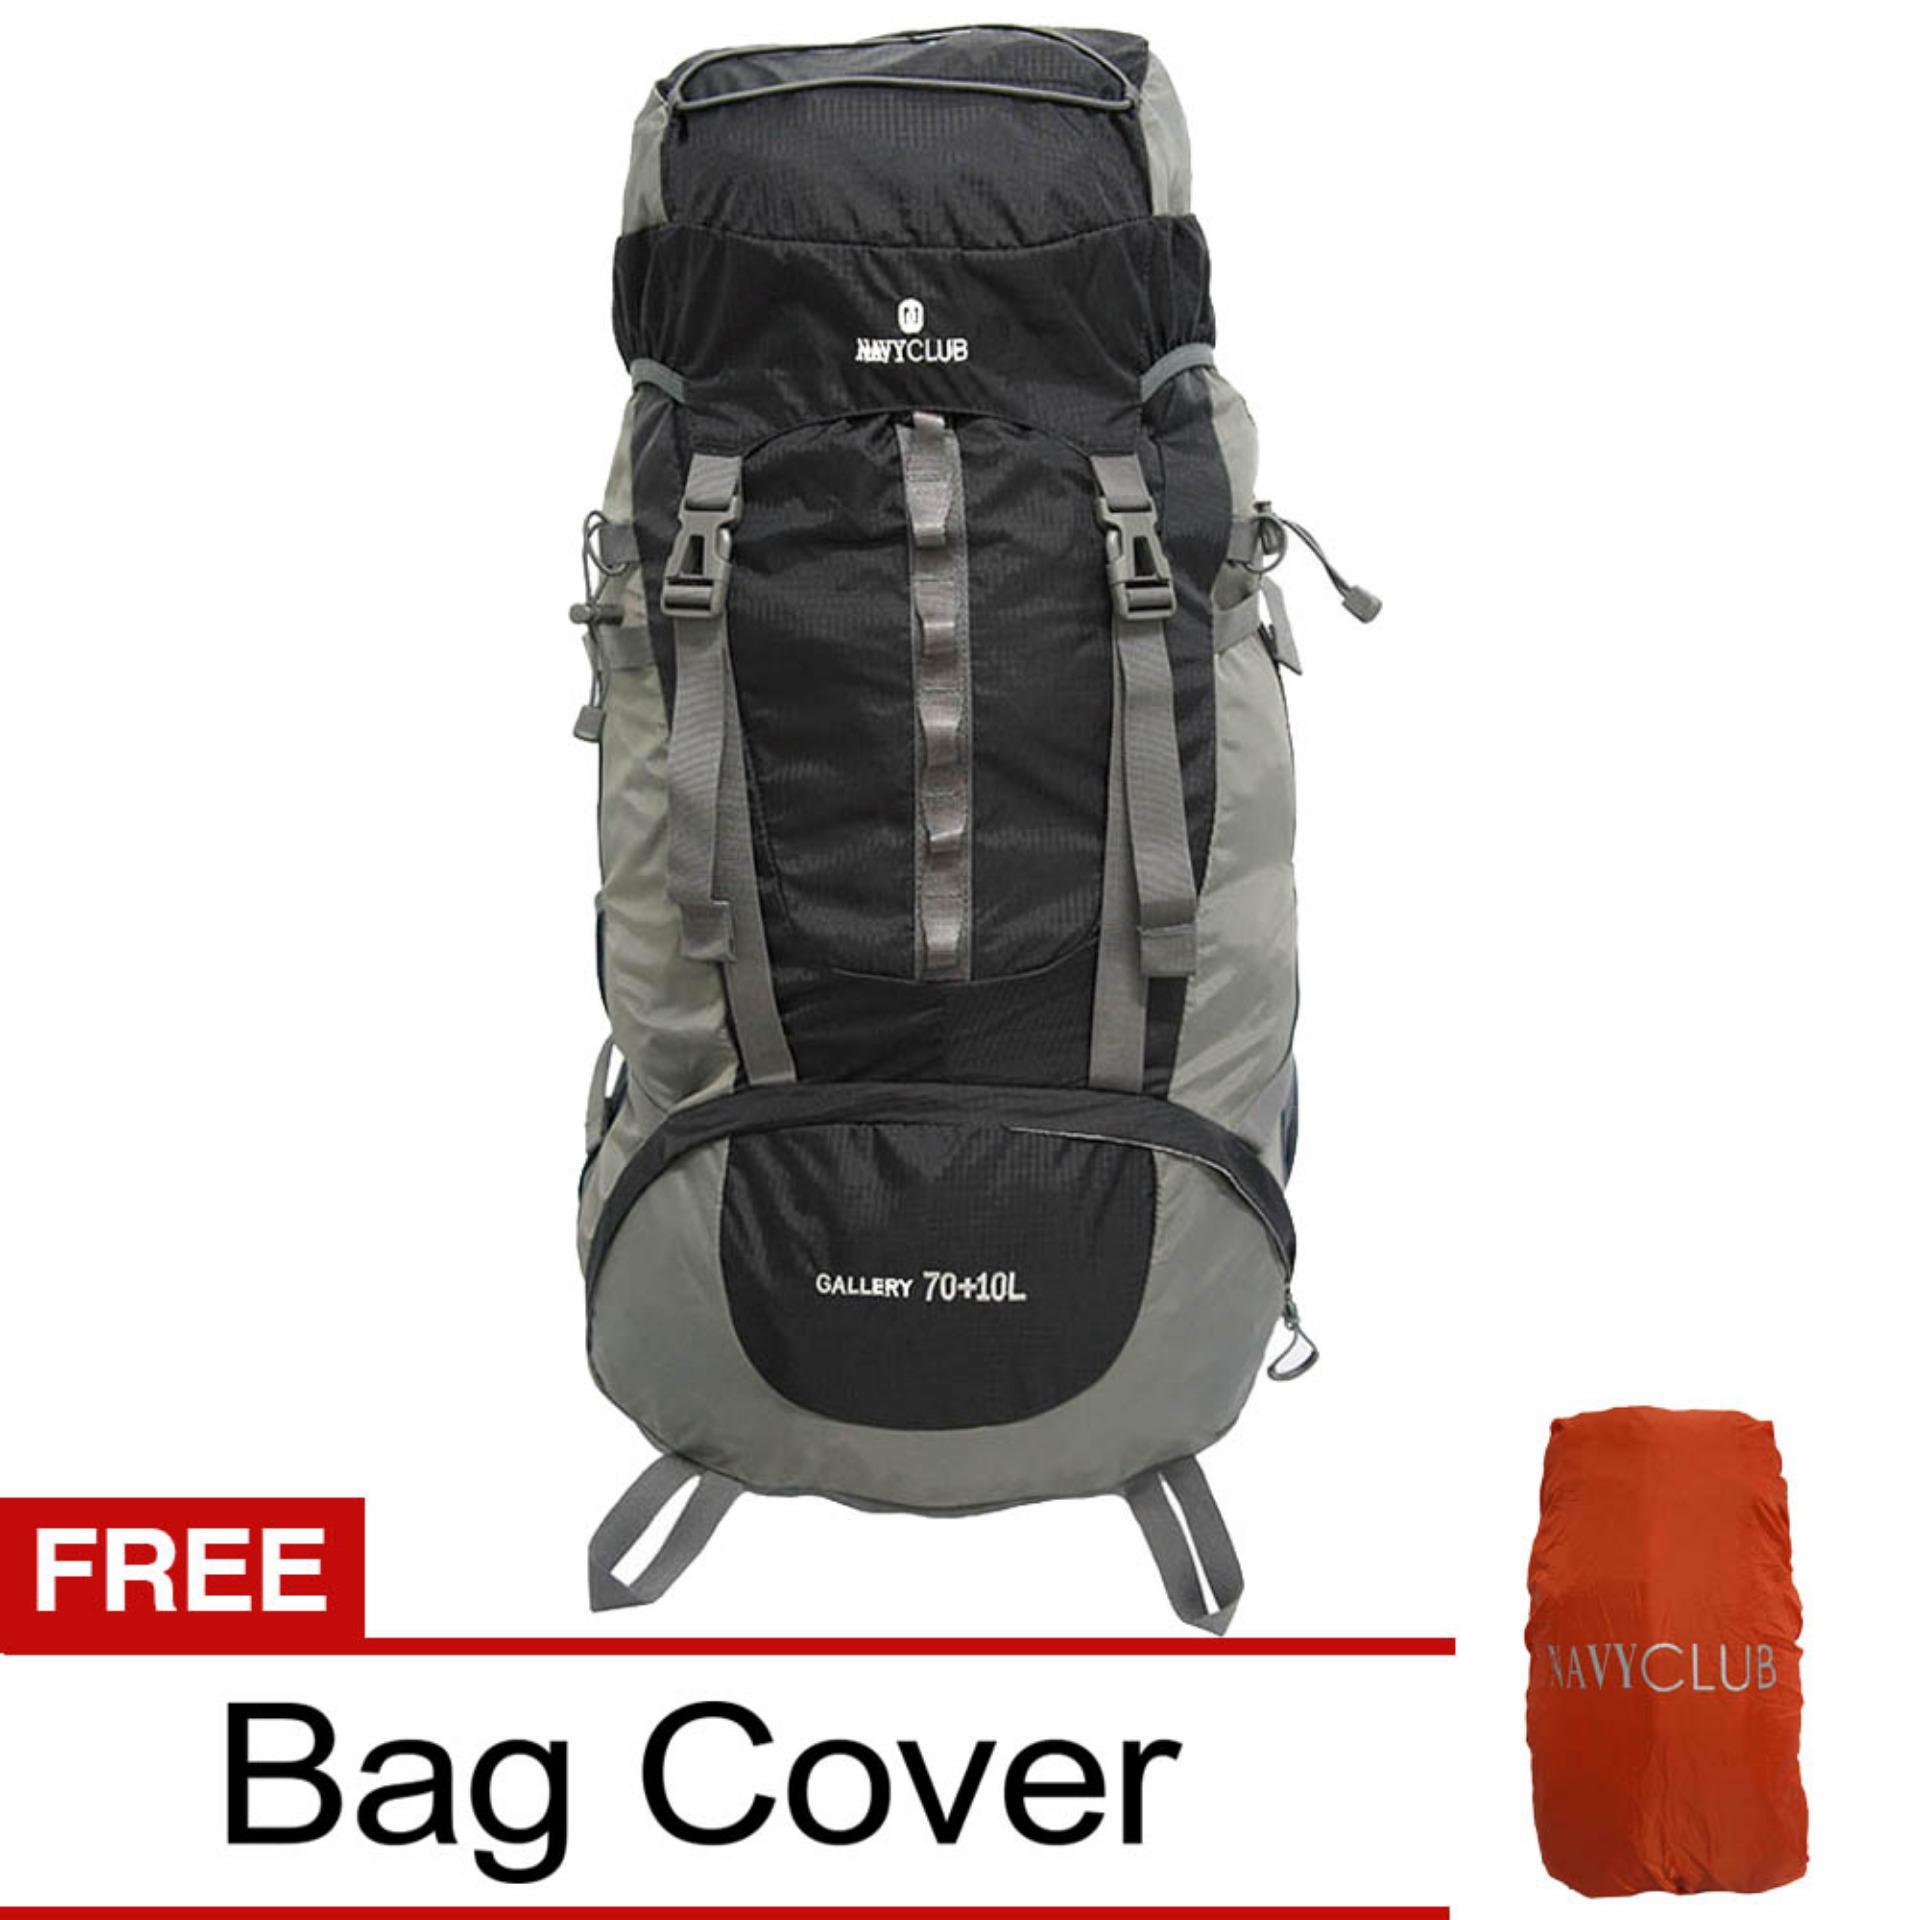 Cara Beli Navy Club Tas Hiking Backpack Ransel Travel Outdoor Carrier 5034 70 10 Liter Gratis Rain Cover Hitam Hk